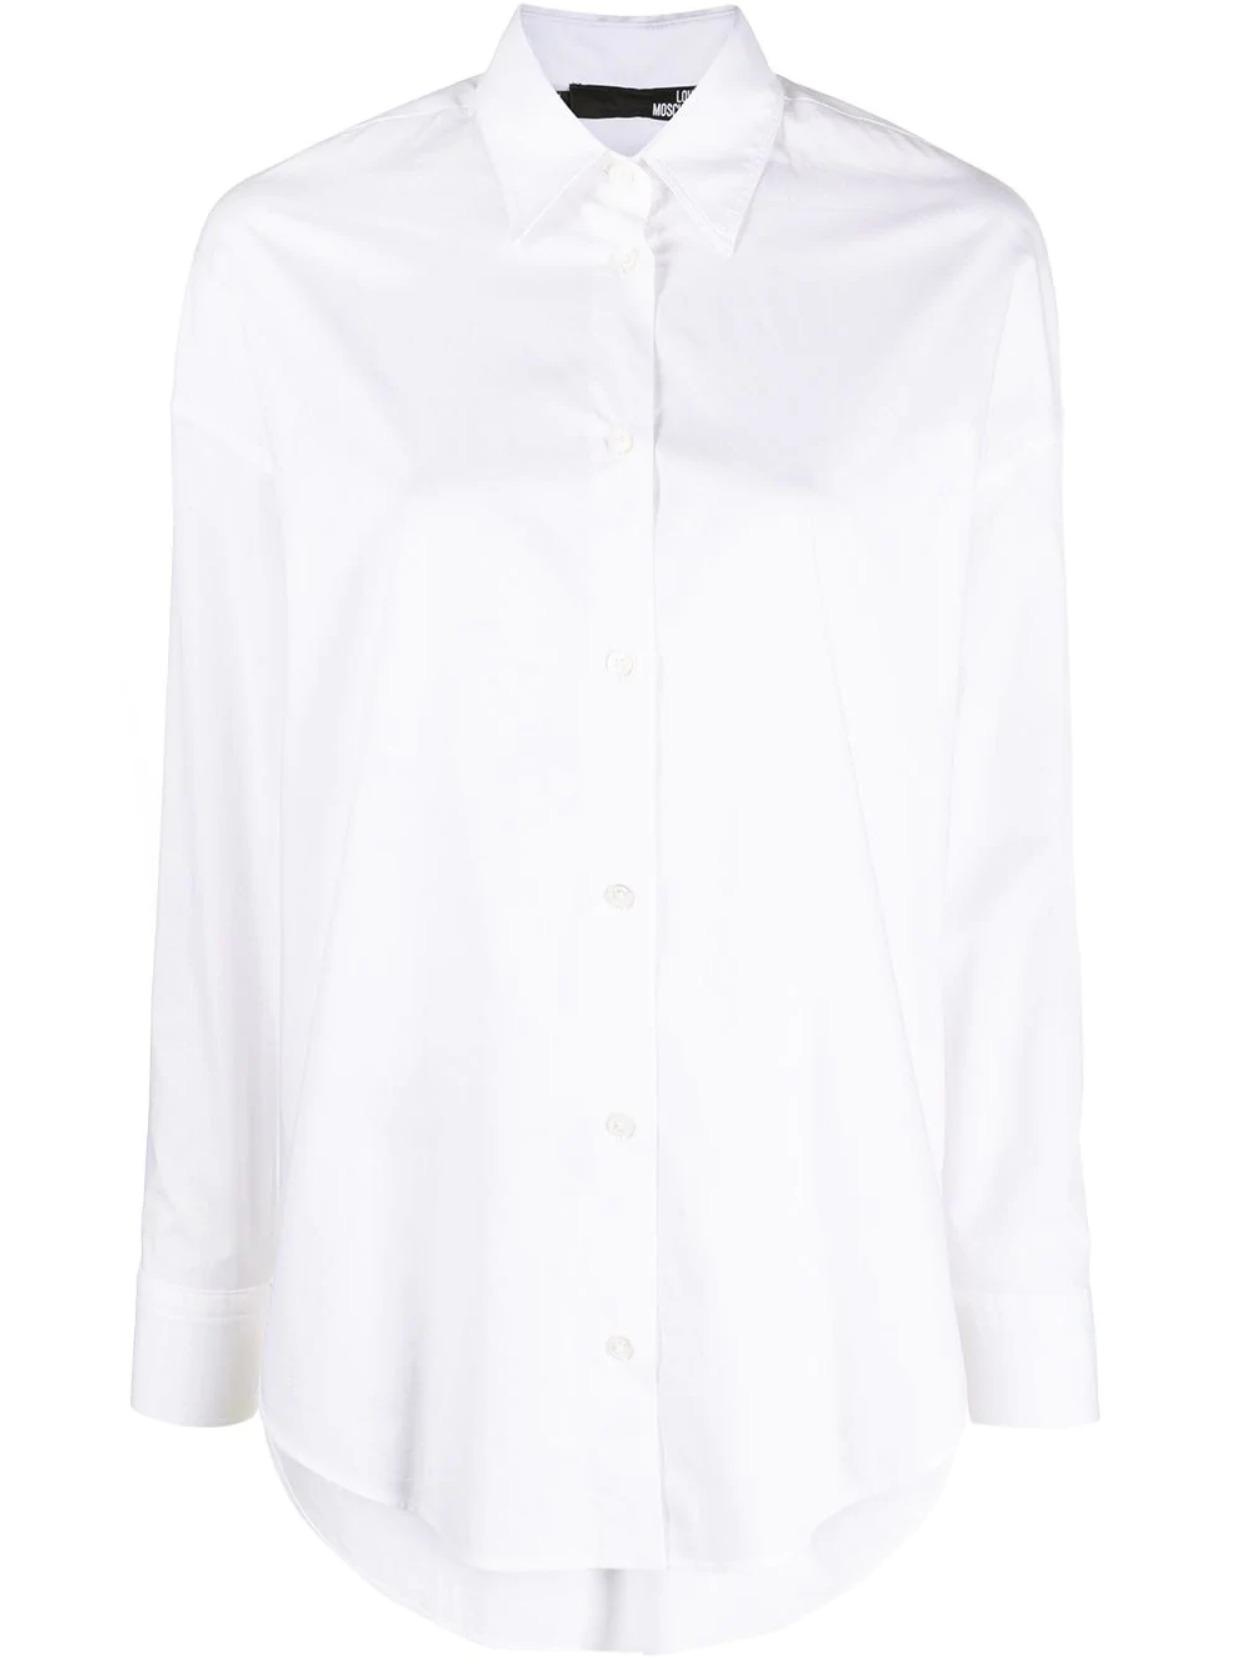 Camicia basic heart love moschino LOVE MOSCHINO | Camicie | WCD40 03 S3296A00